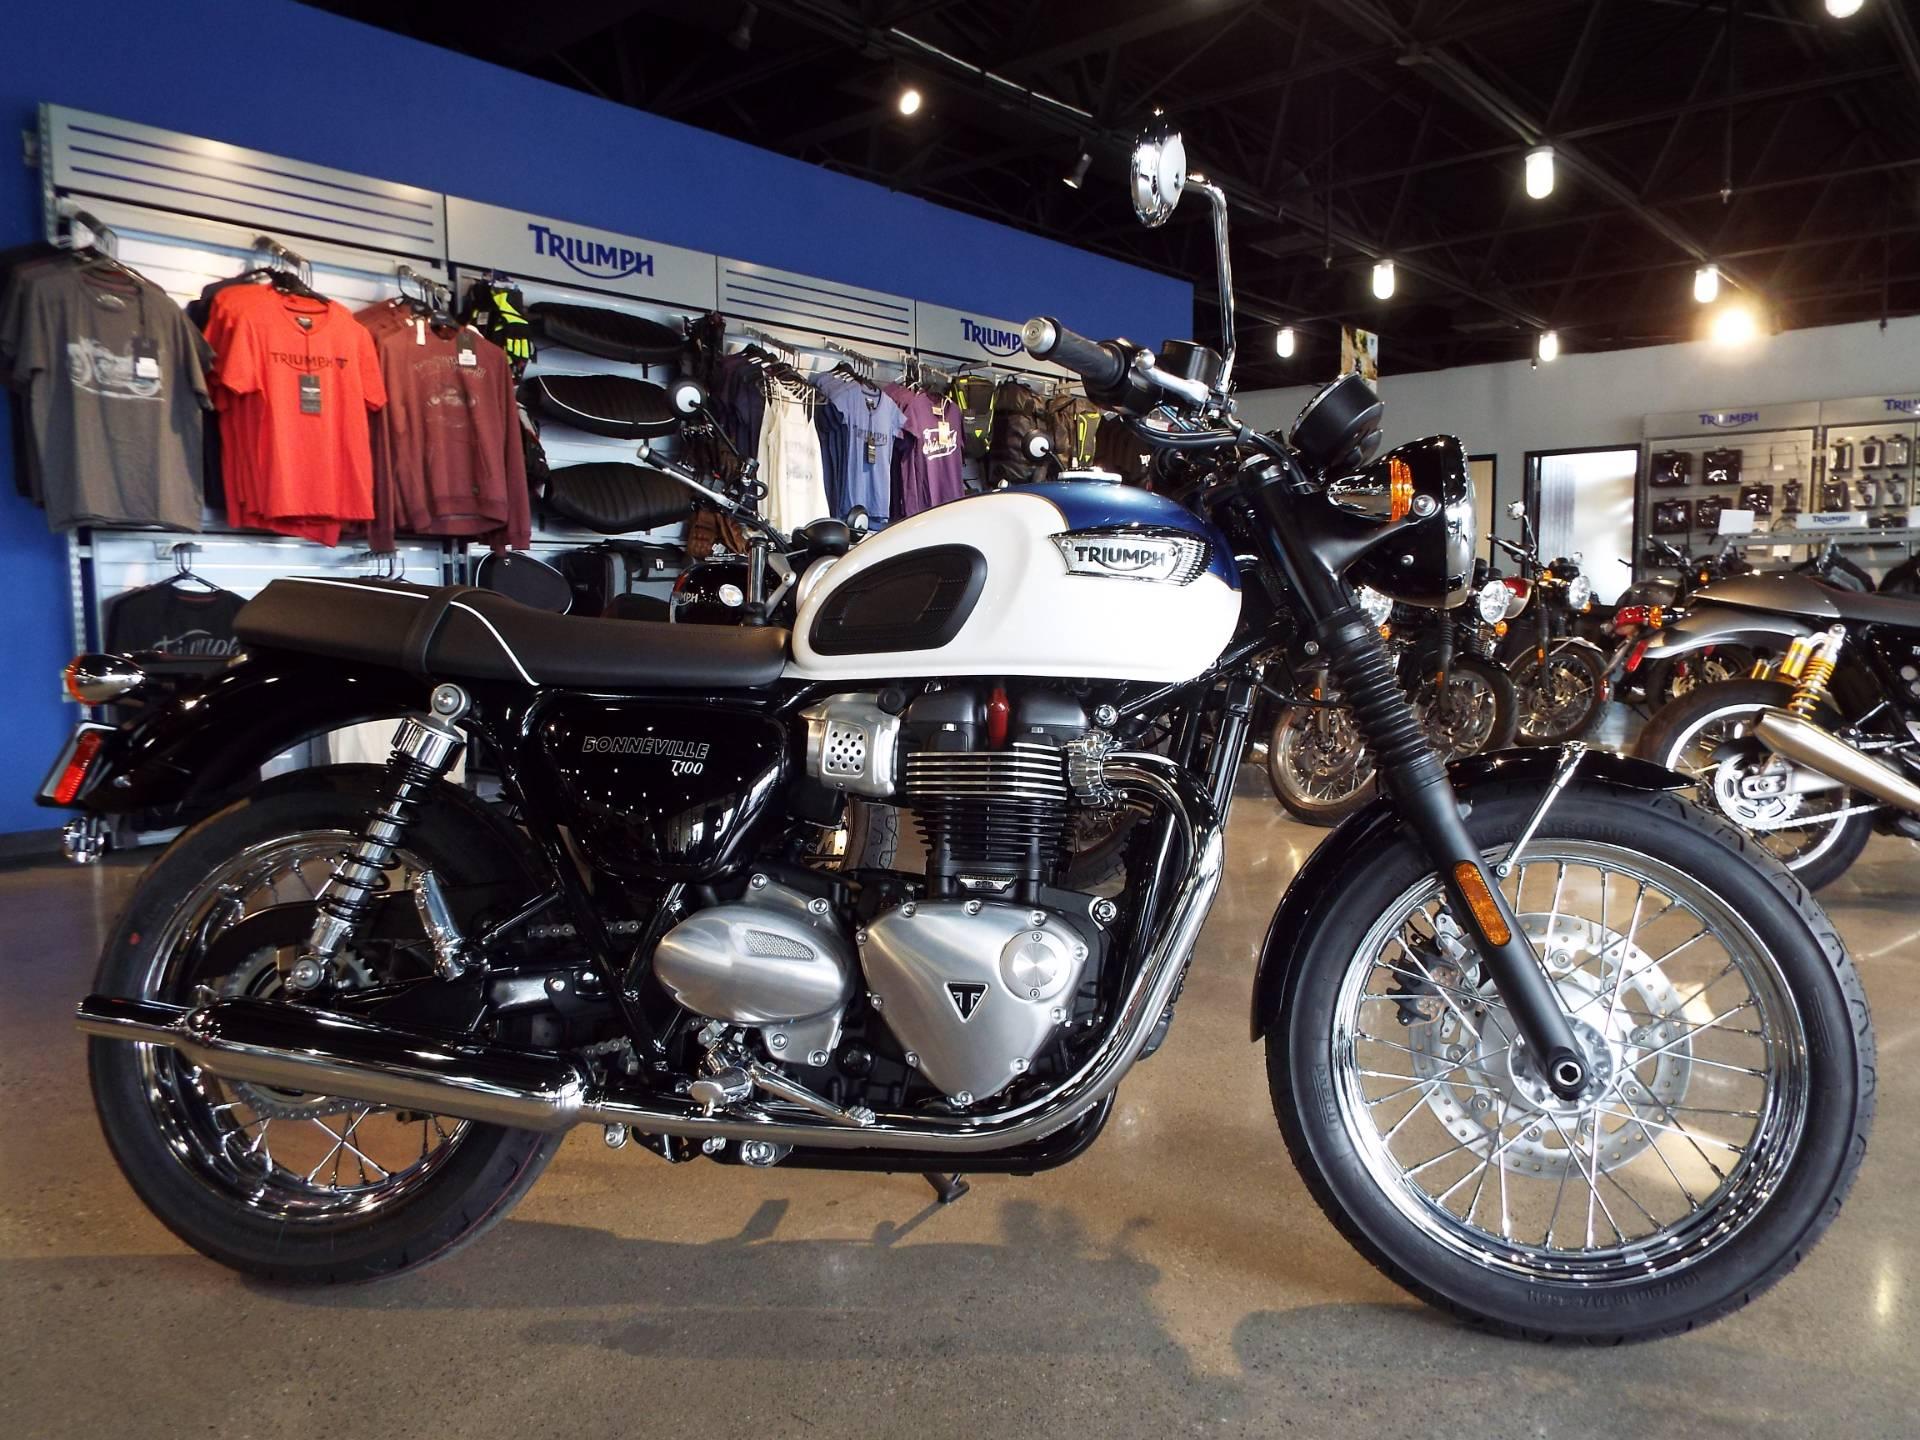 2017 Triumph Bonneville T100 in San Bernardino, California